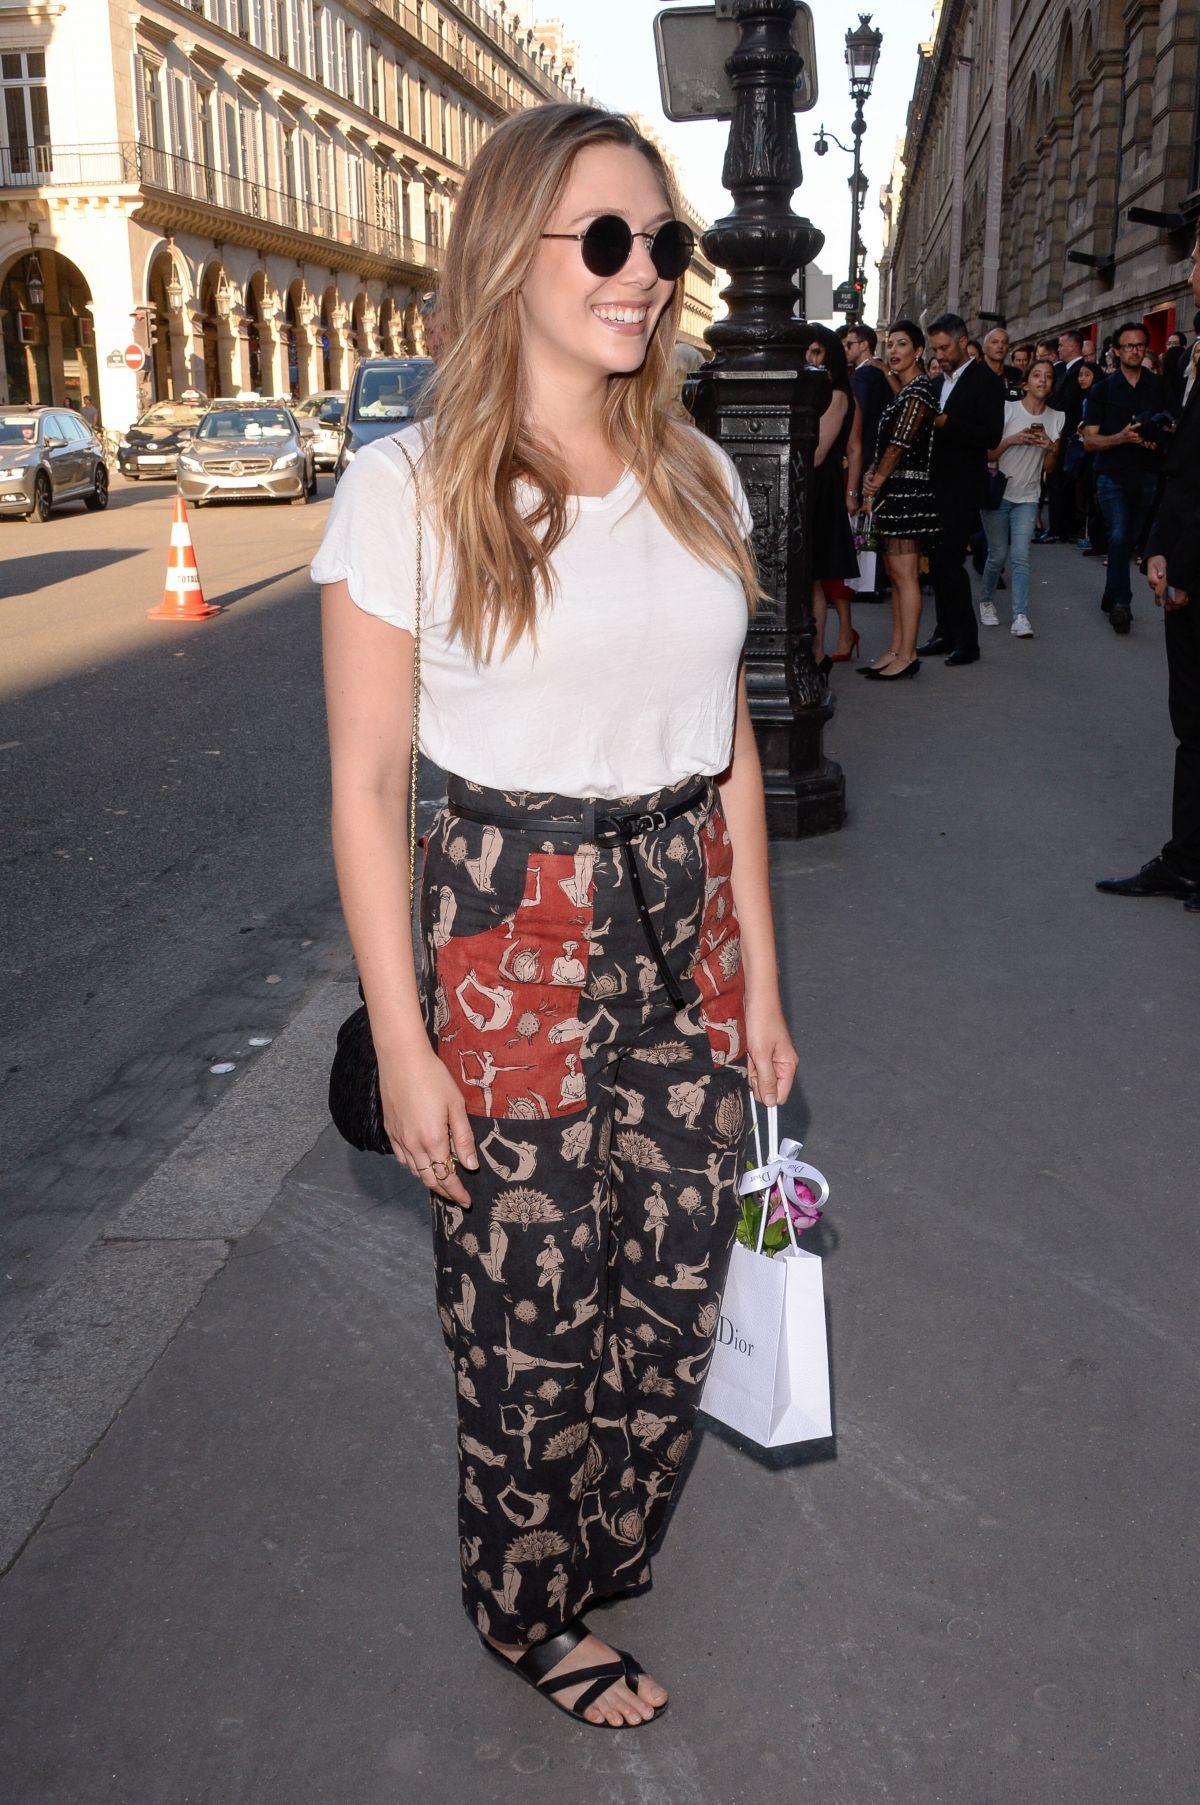 ELIZABETH OLSEN Arrives at Christian Dior Exhibition Party in Paris 07/03/2017